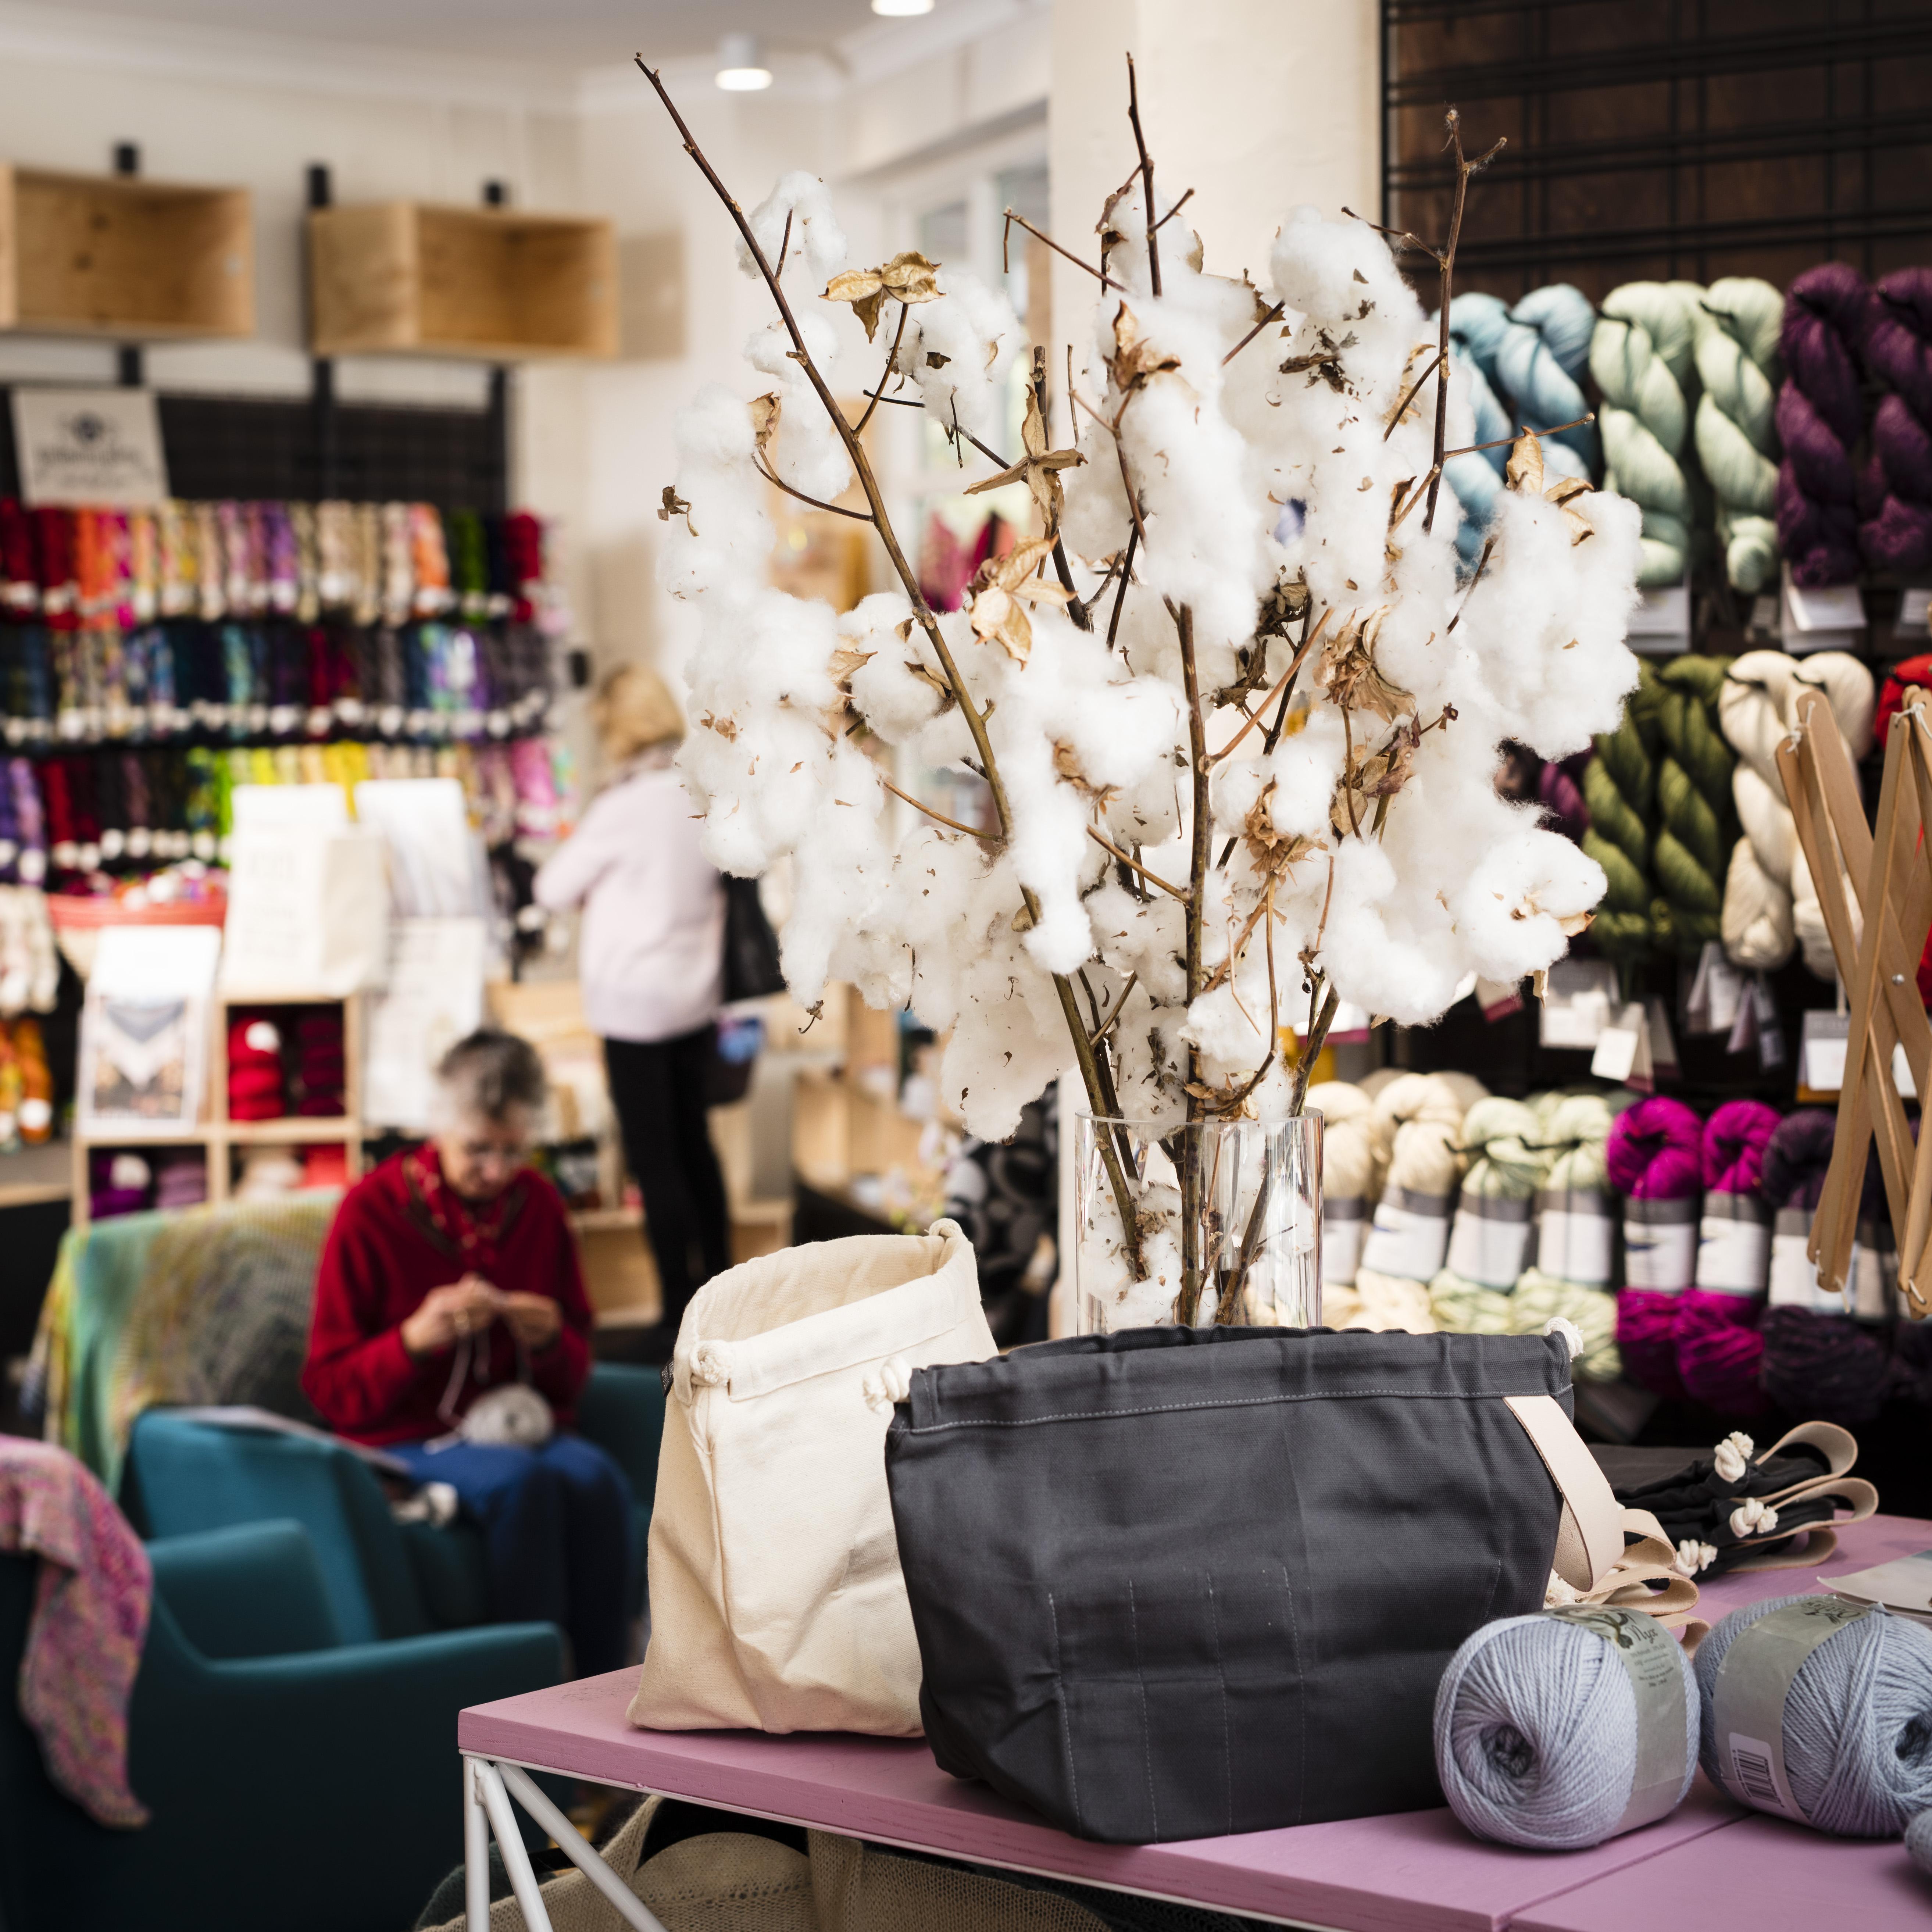 https://sydney-craft-week-prd.s3.amazonaws.com/media/uploads/images/Shop_interior_Skein_Sisters._Pic_by_Philip_Le_Masurier.jpg